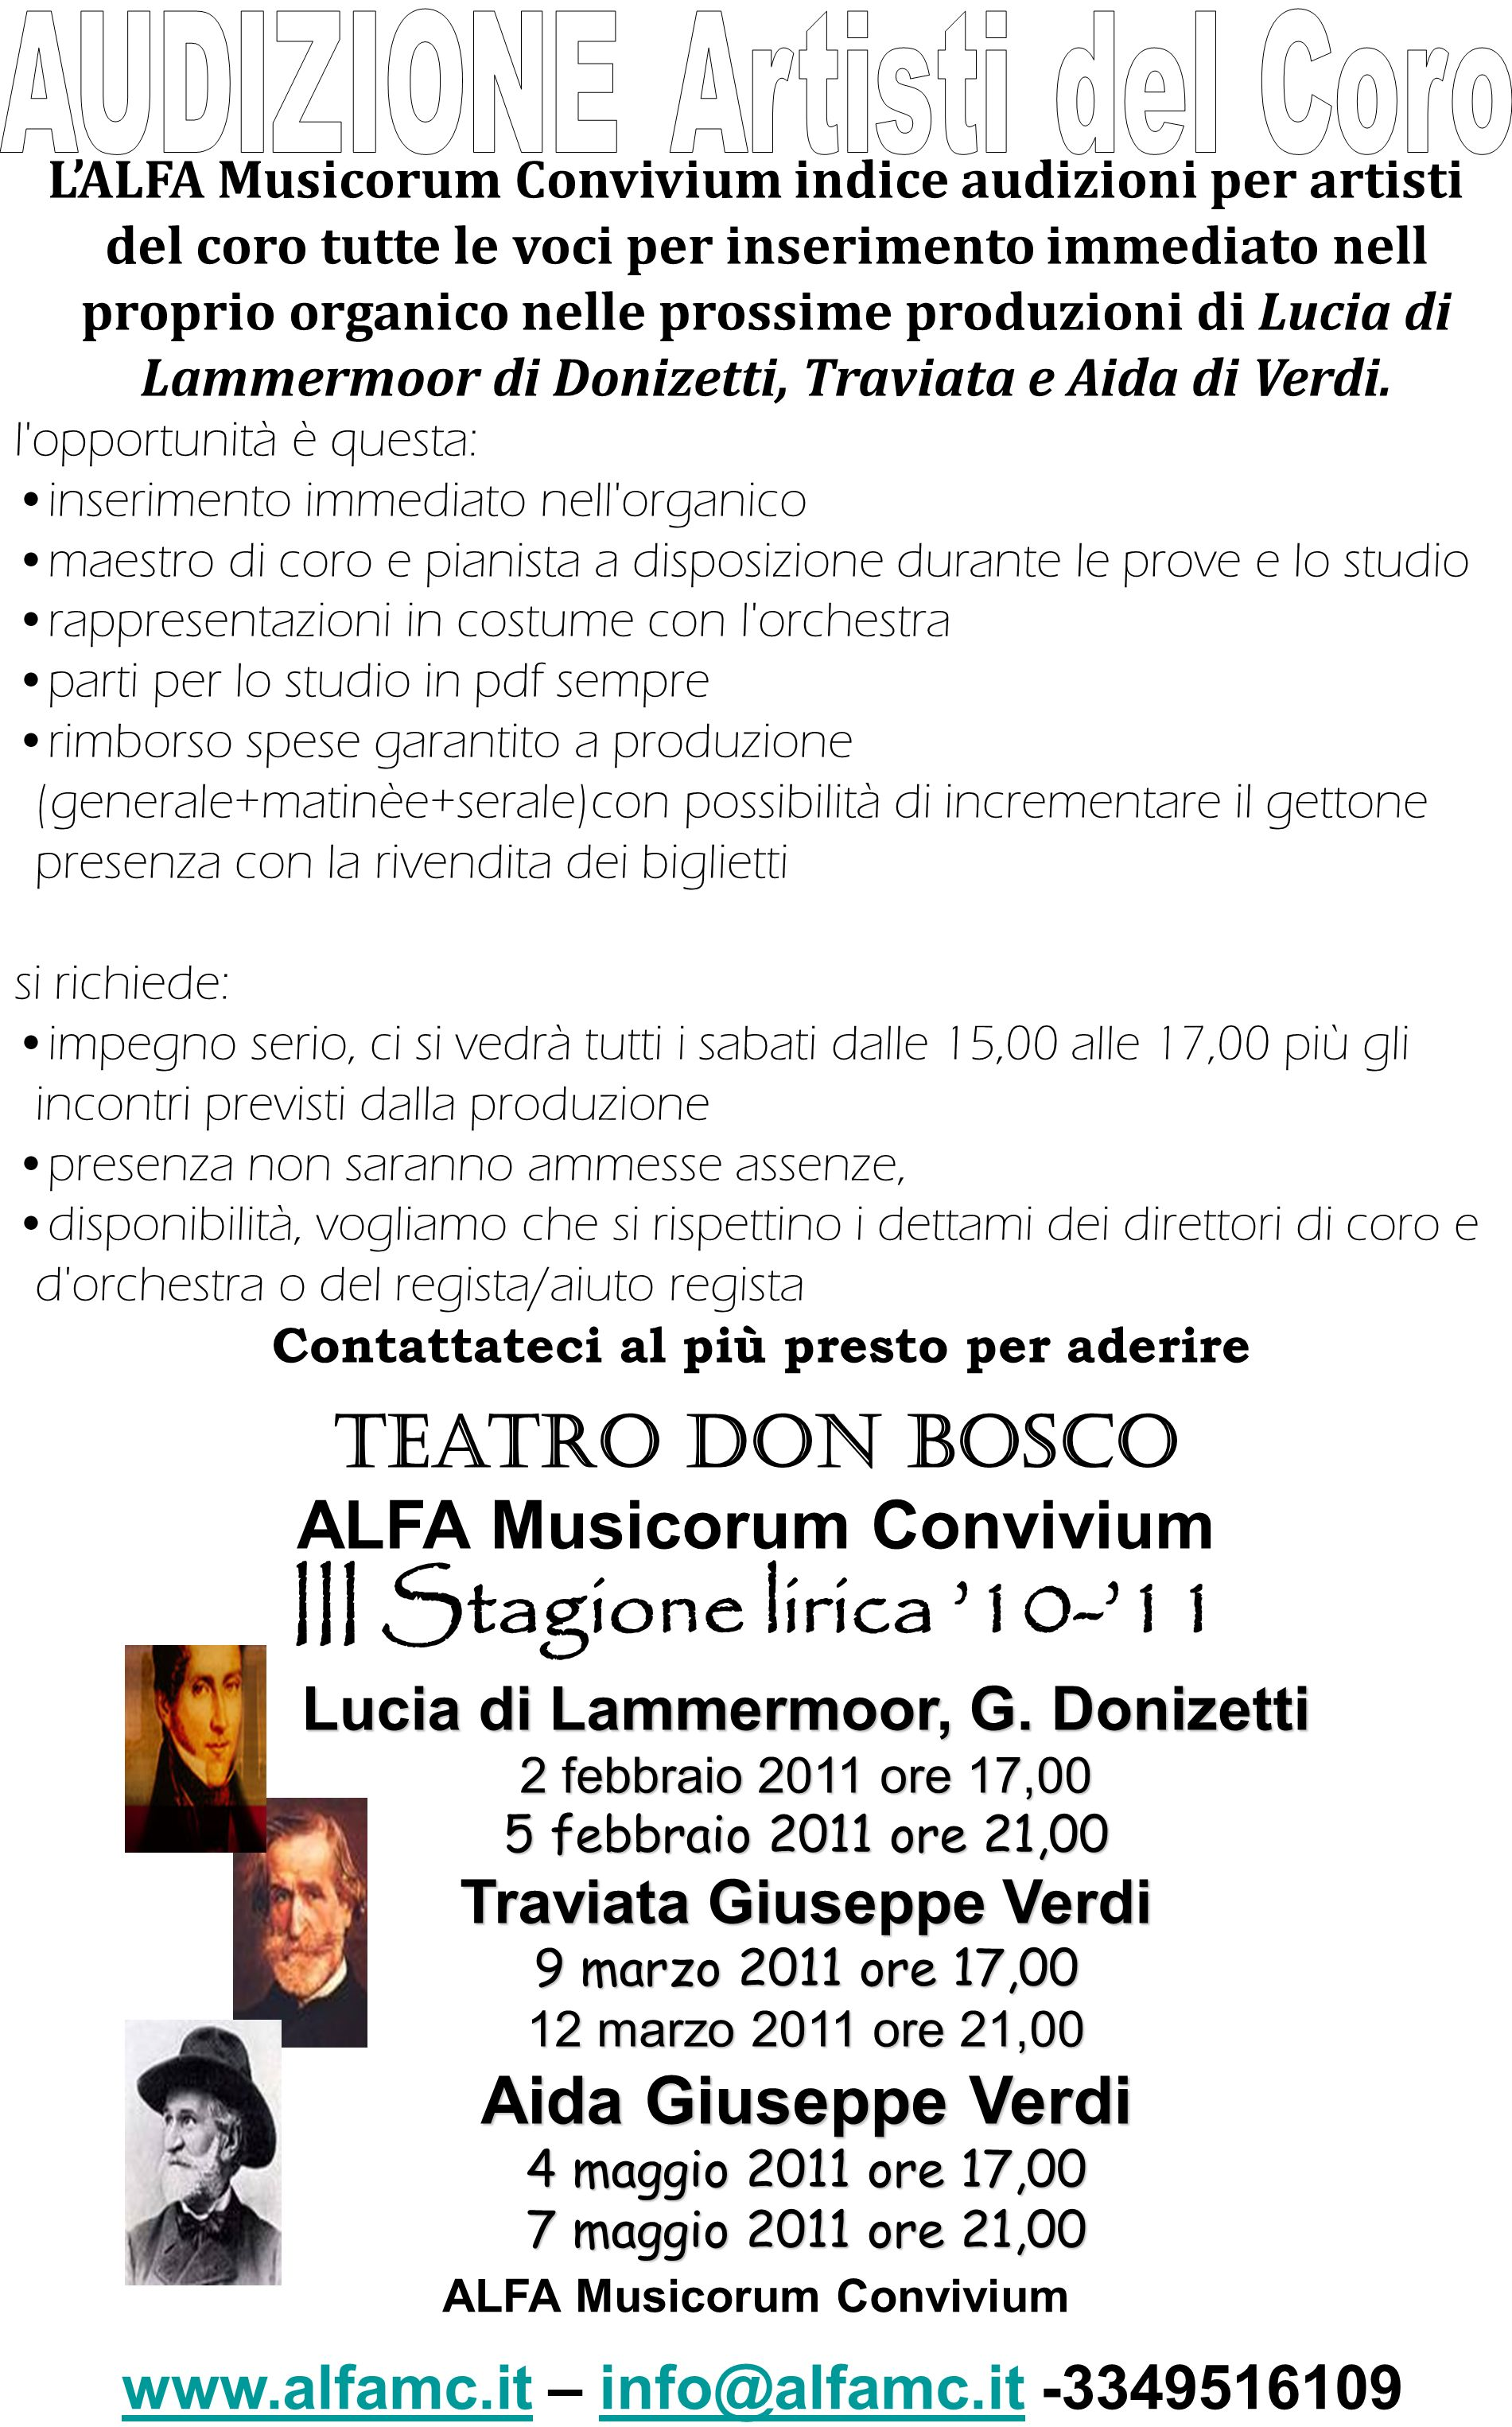 III Stagione lirica '10-'11